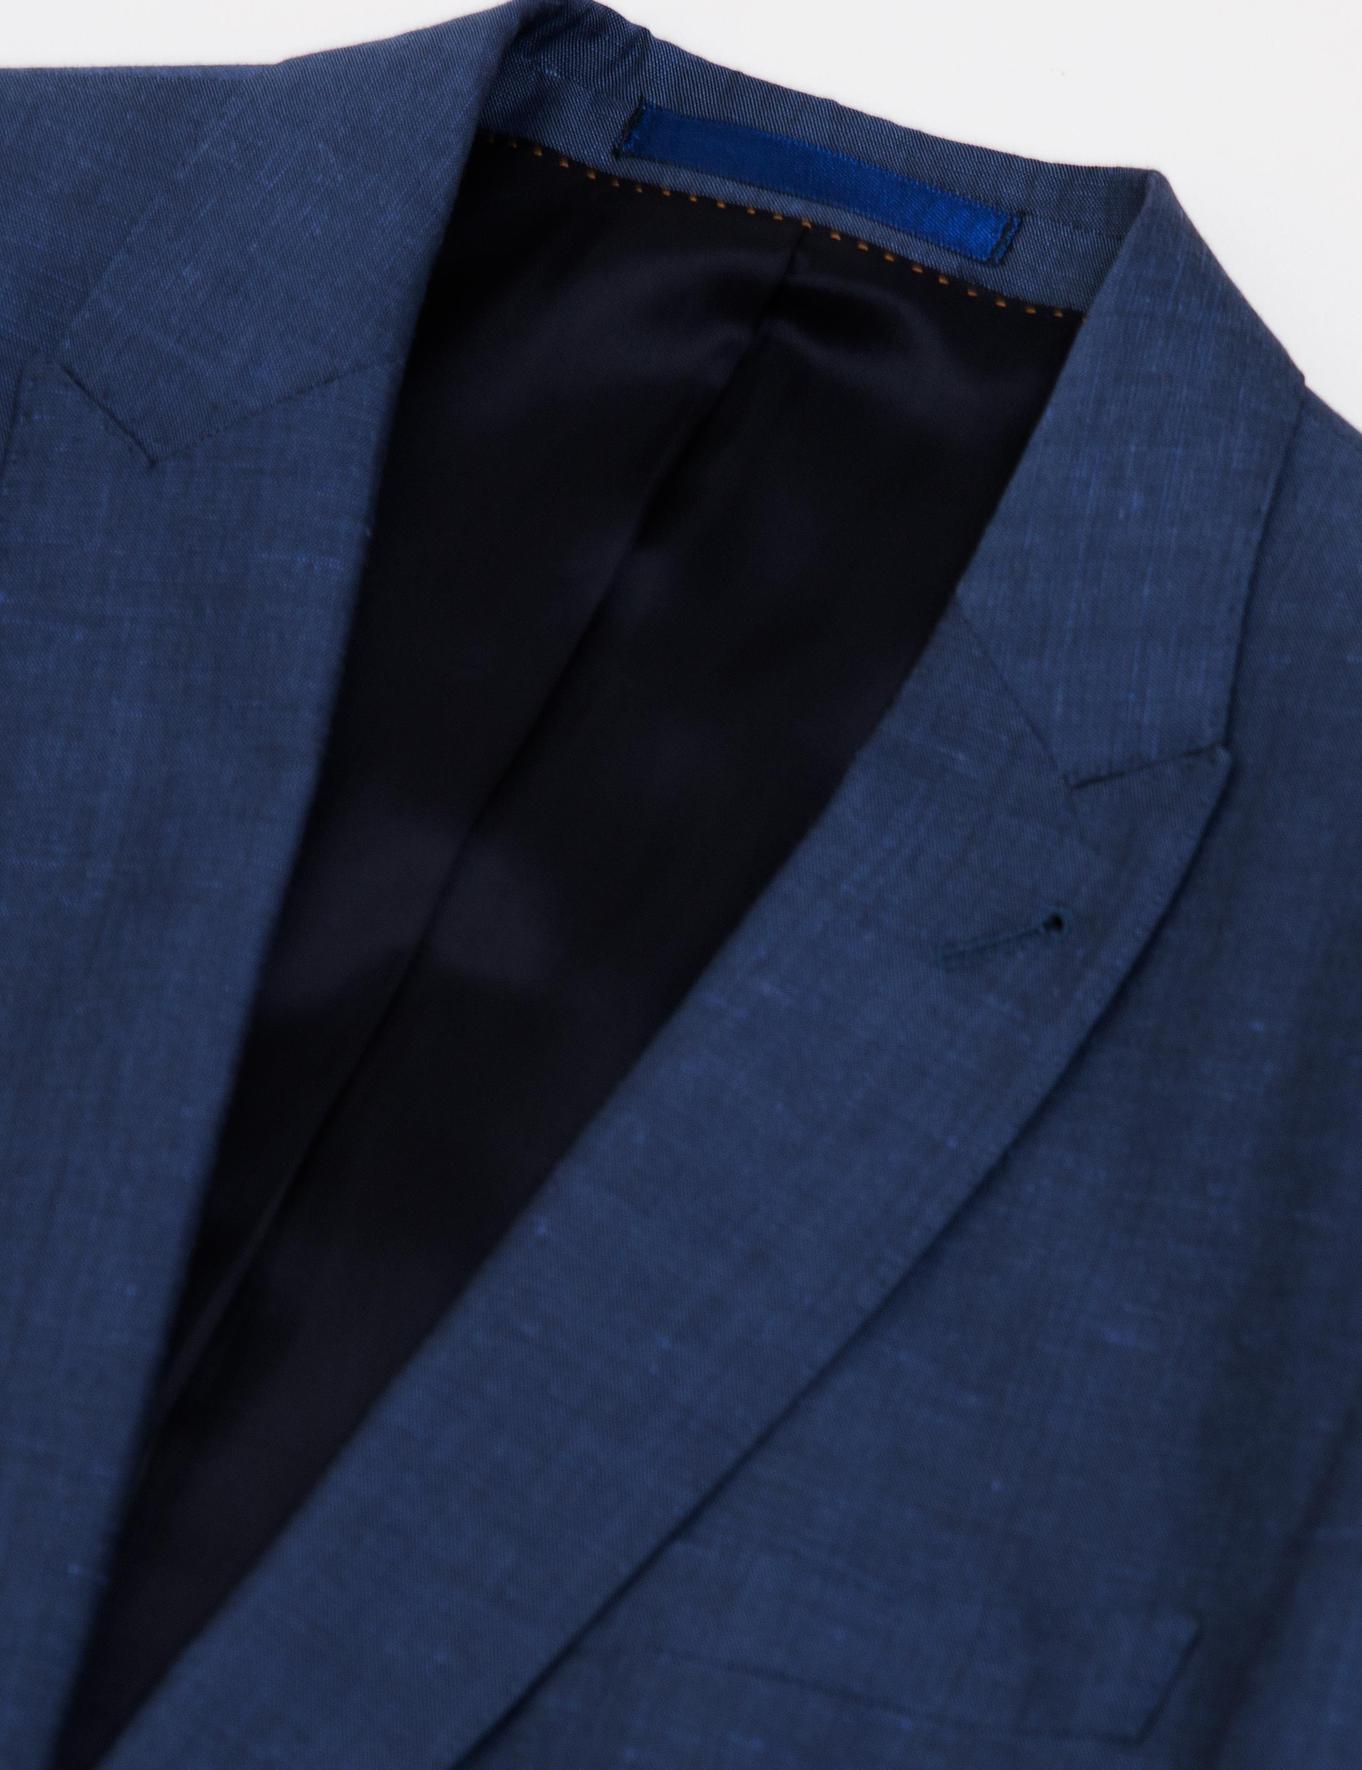 Koyu Mavi Slim Fit Takım Elbise - 50185598008